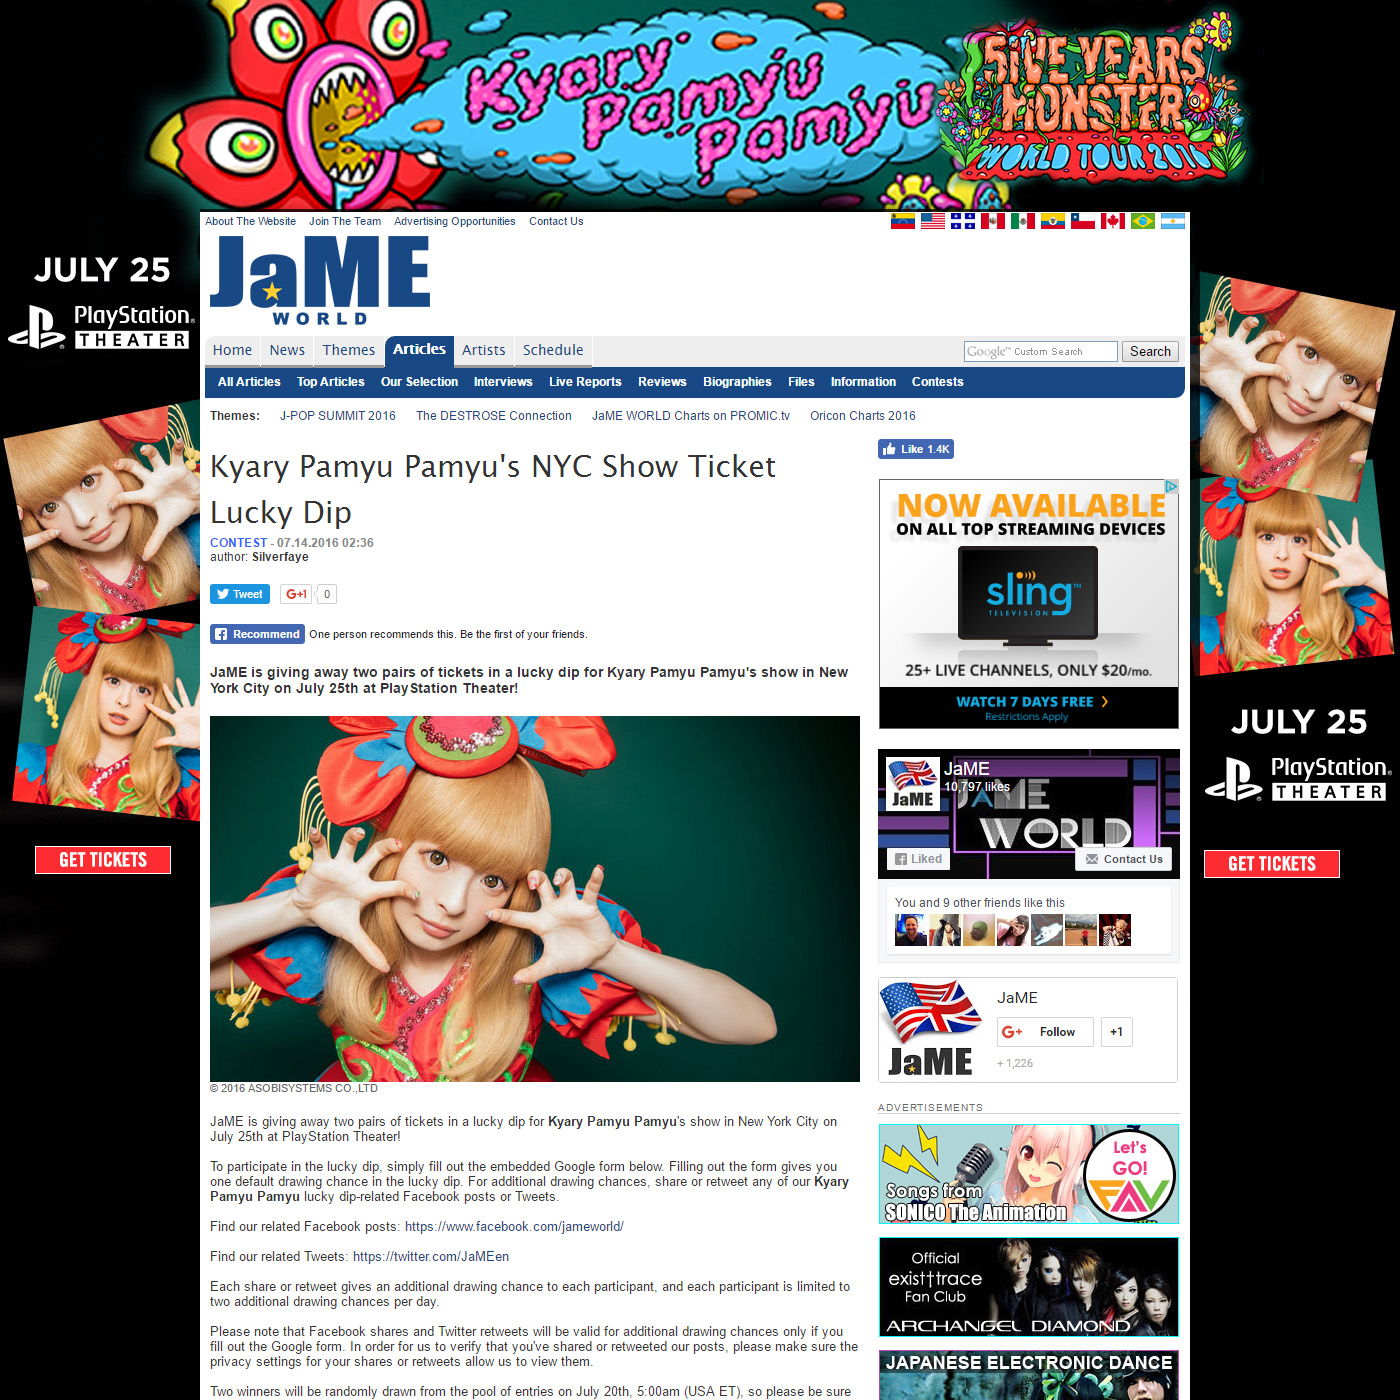 RMMS-Kyary-Pamyu-Pamyu-NYC-Campaign-1-JaME-skin